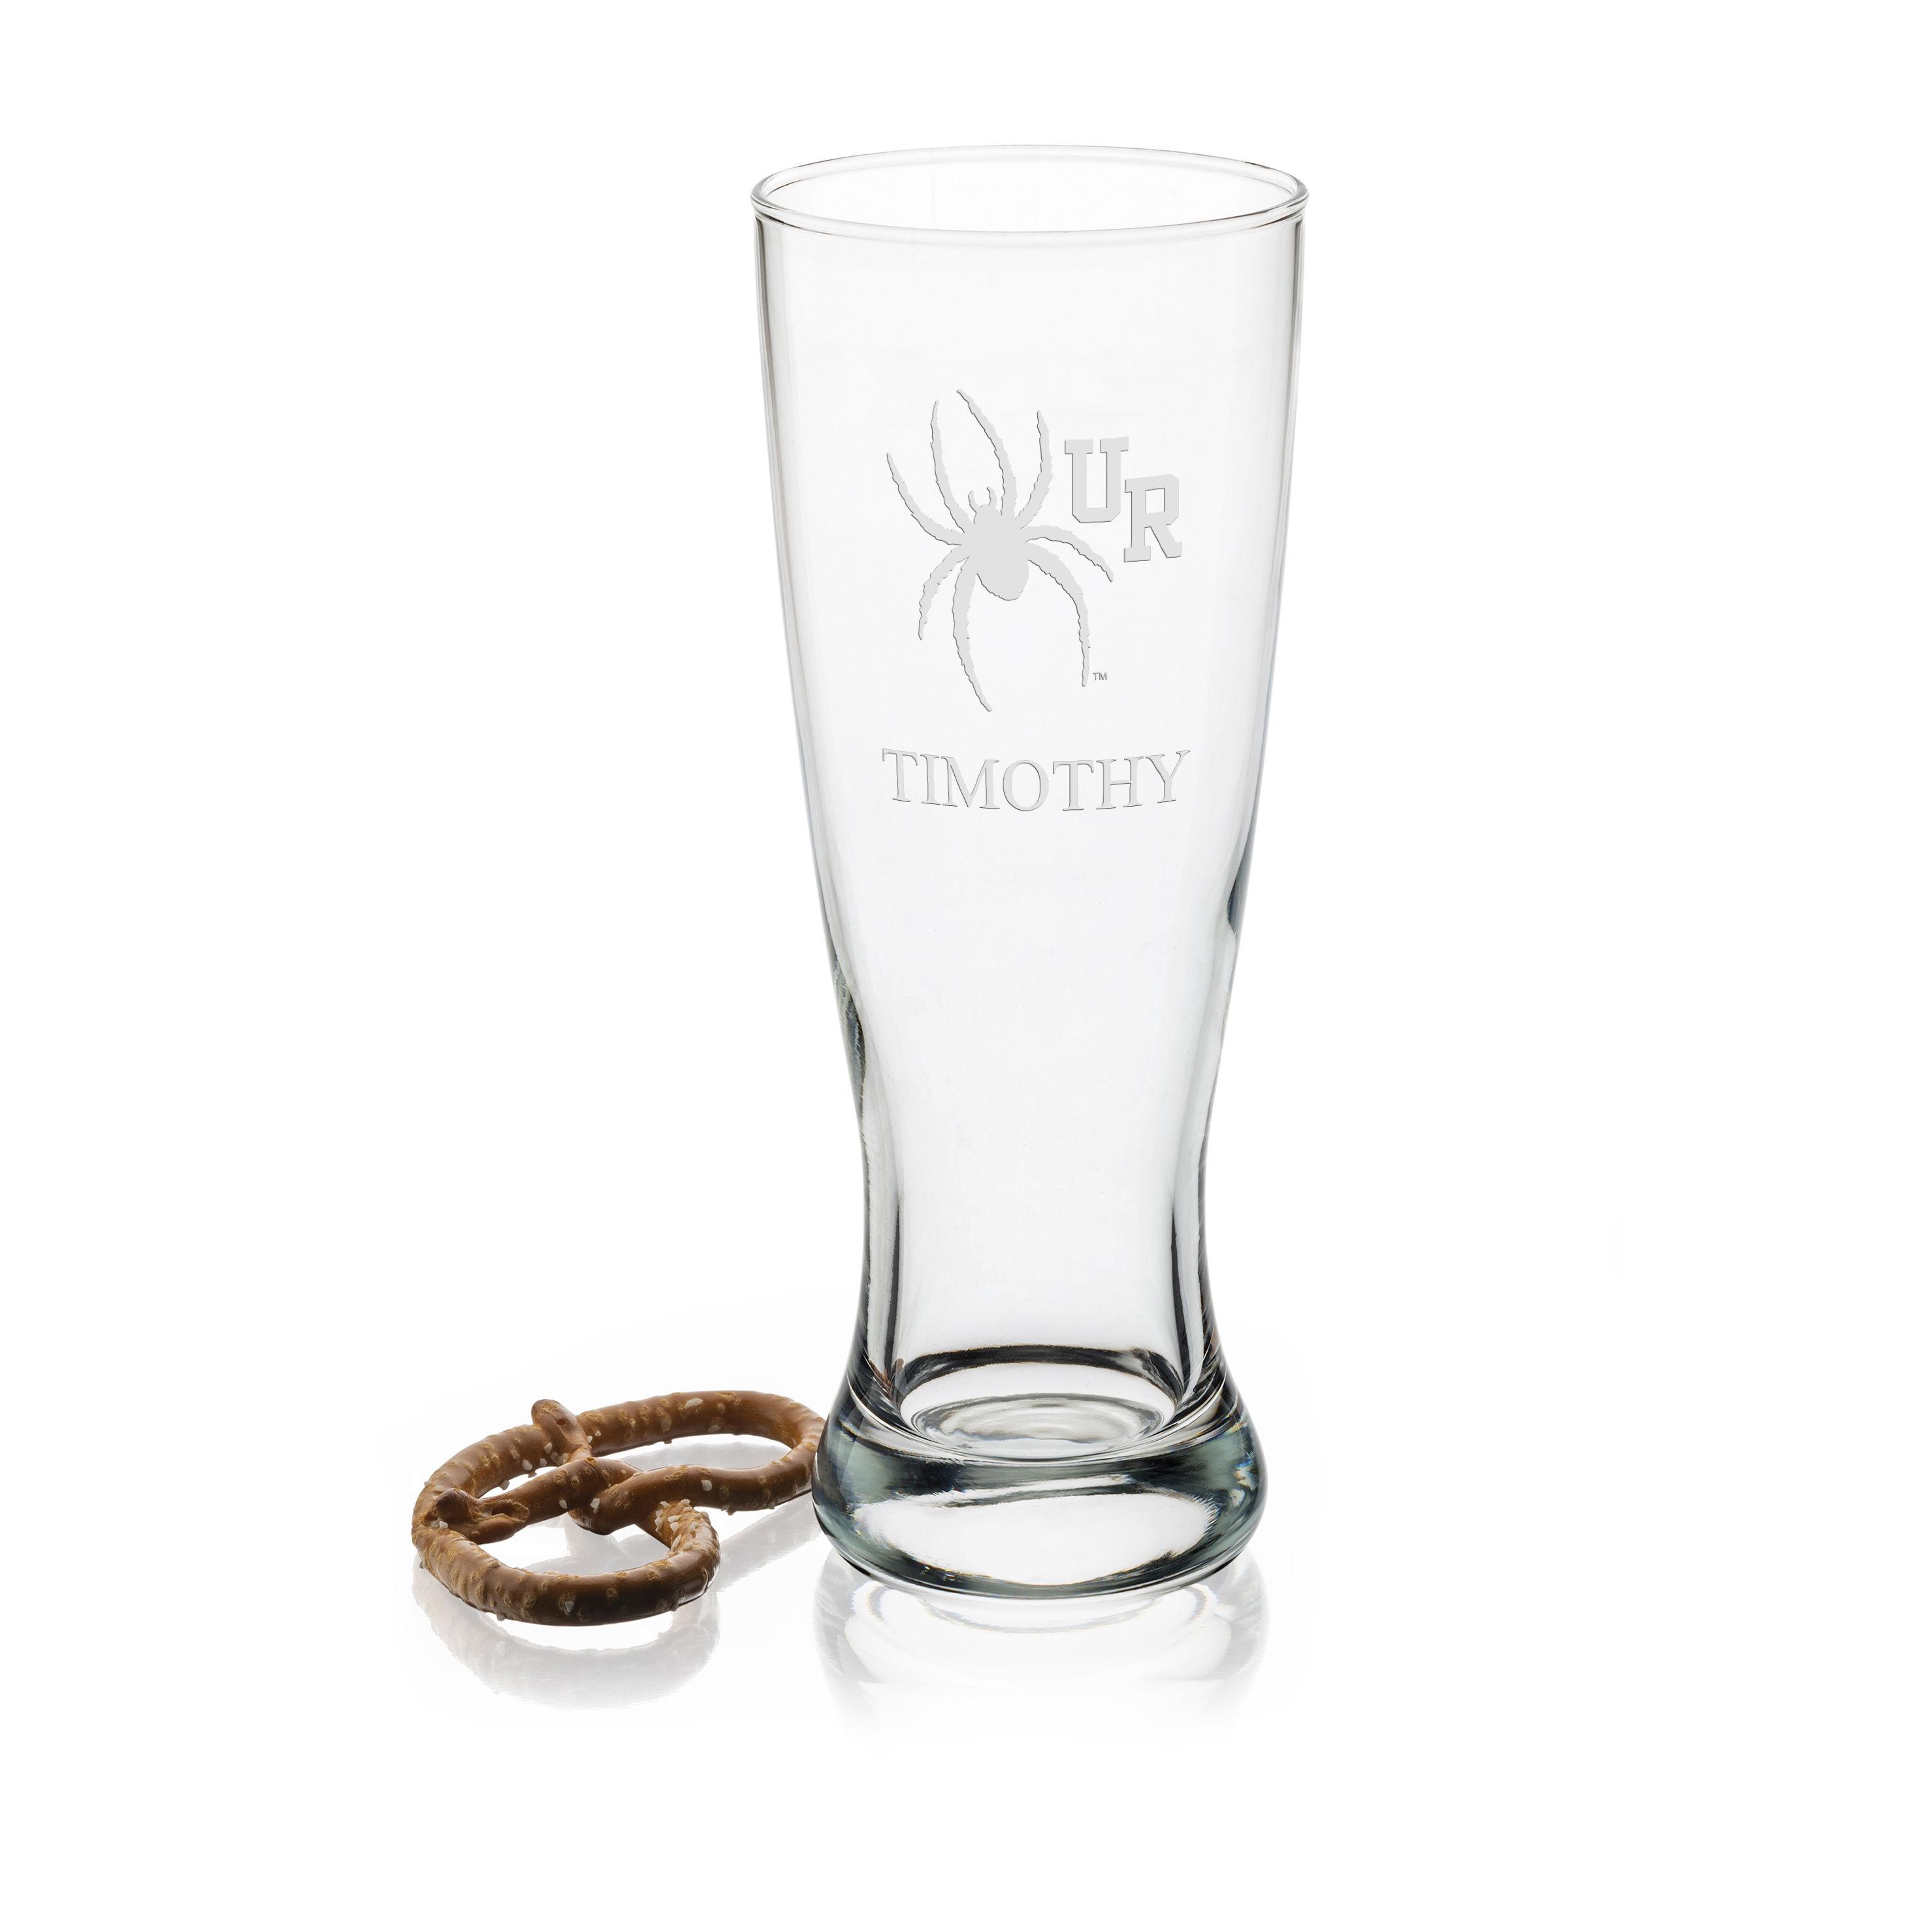 University of Richmond 20oz Pilsner Glasses - Set of 2